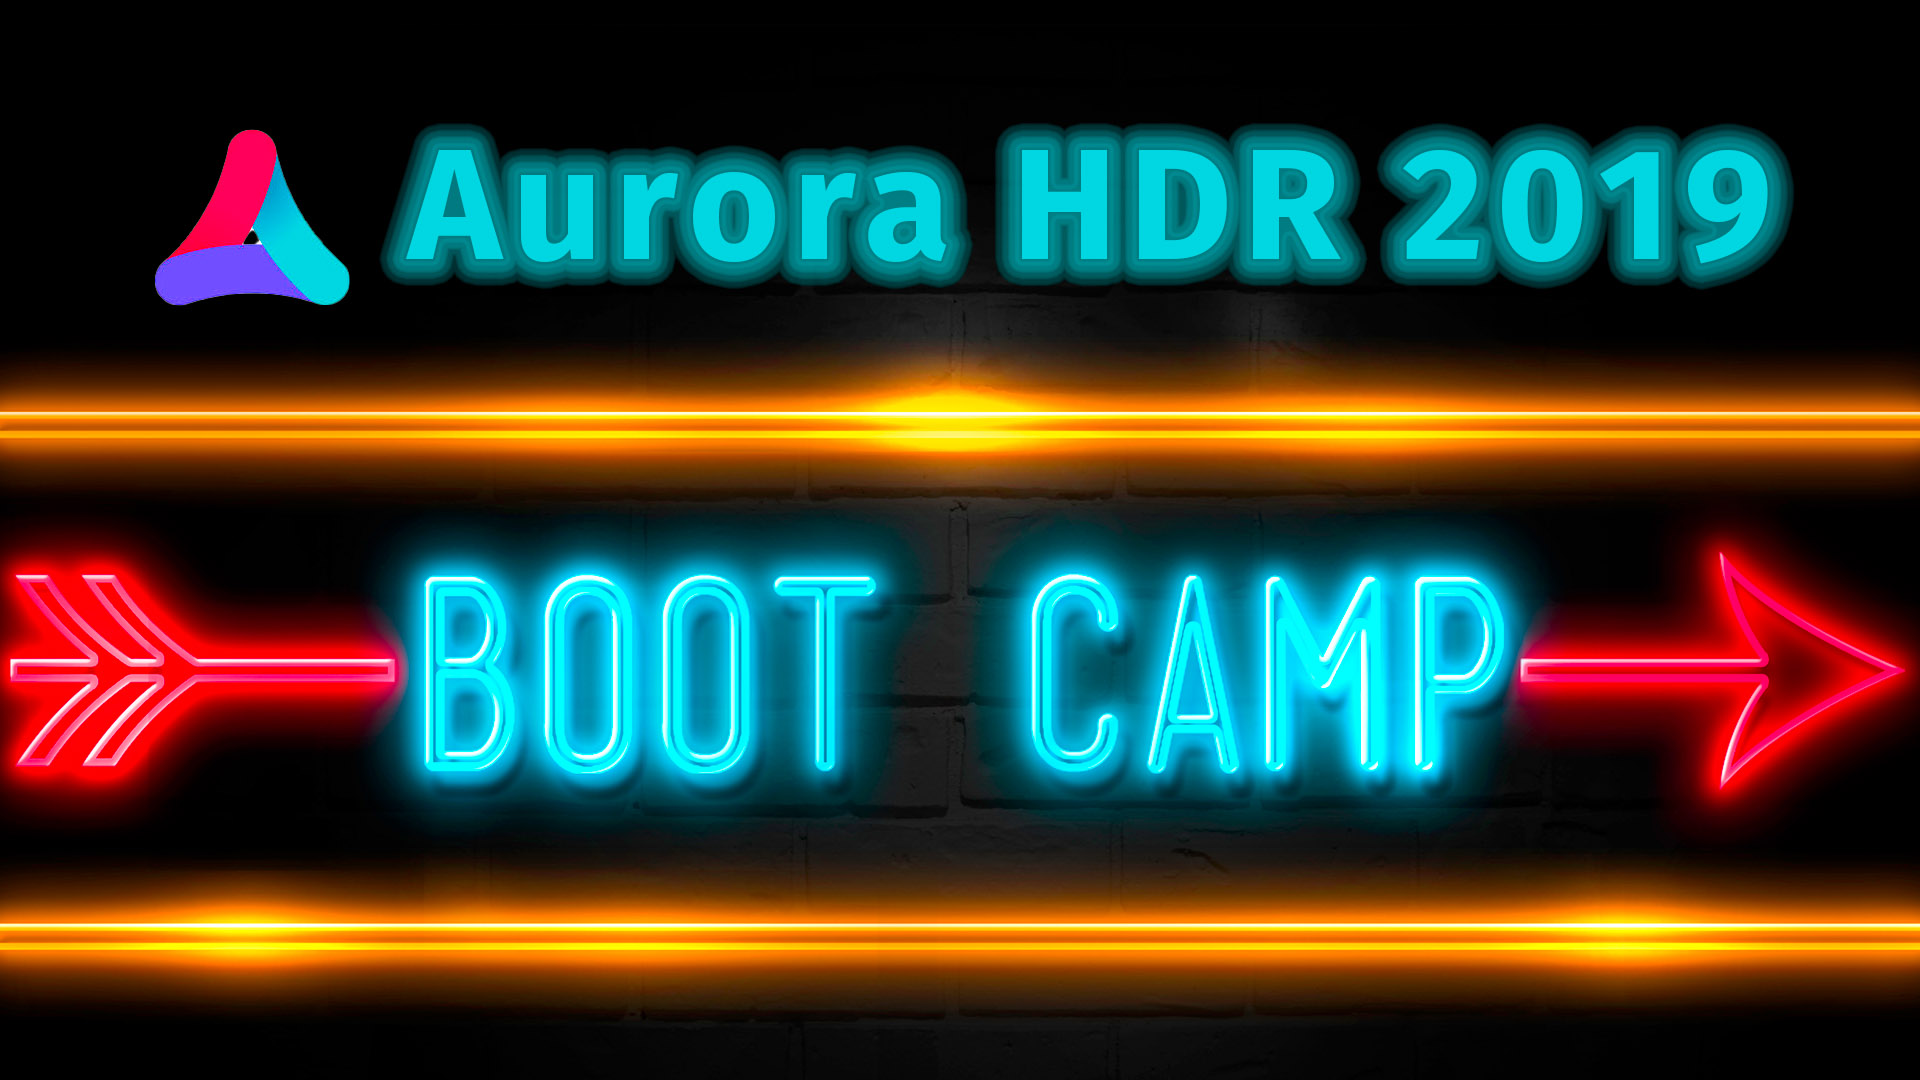 Pre order Aurora HDR 2019